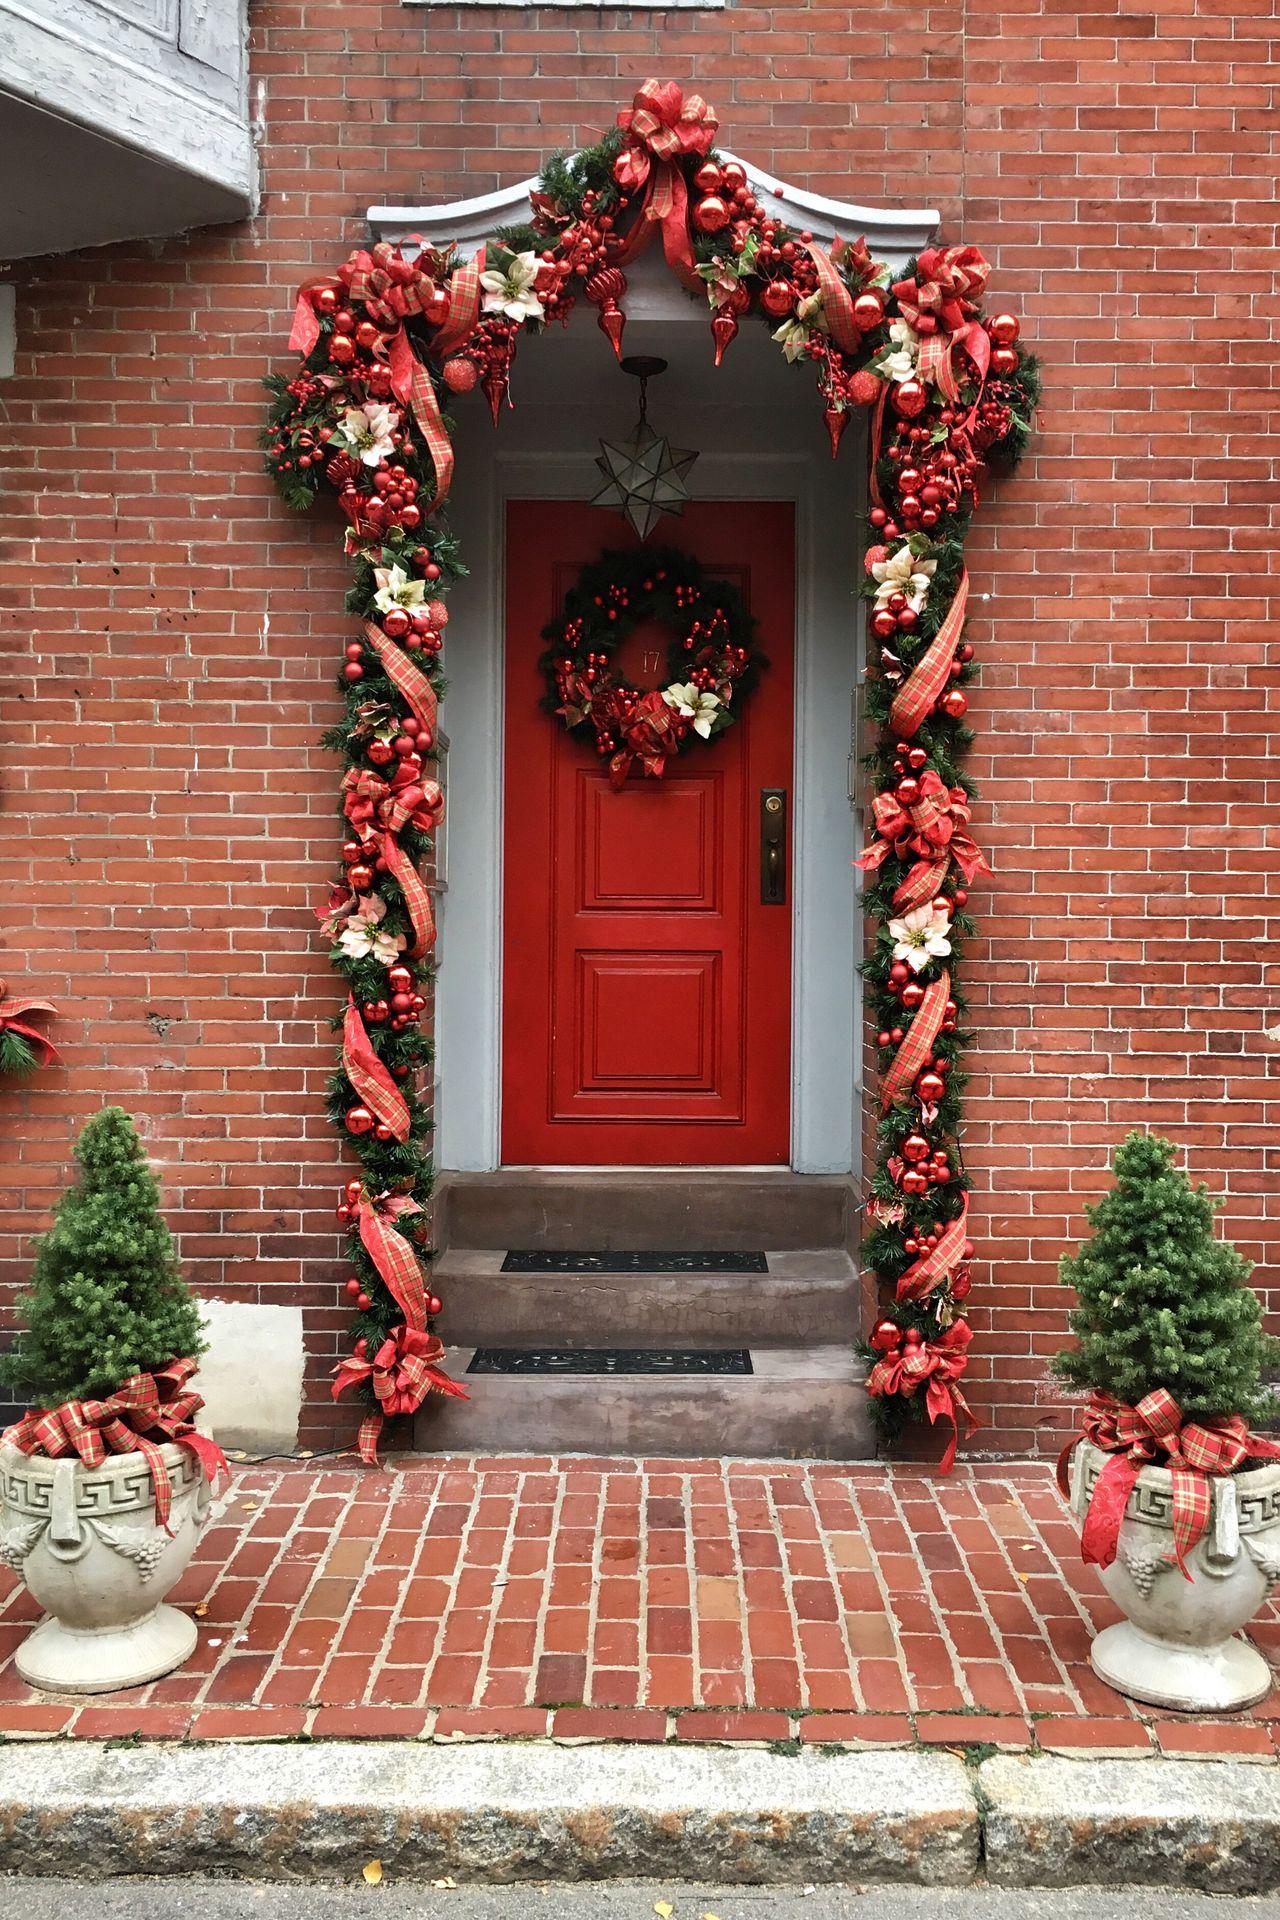 Festive Season Christmas Decoration Decorated Door Outdoor Decorations